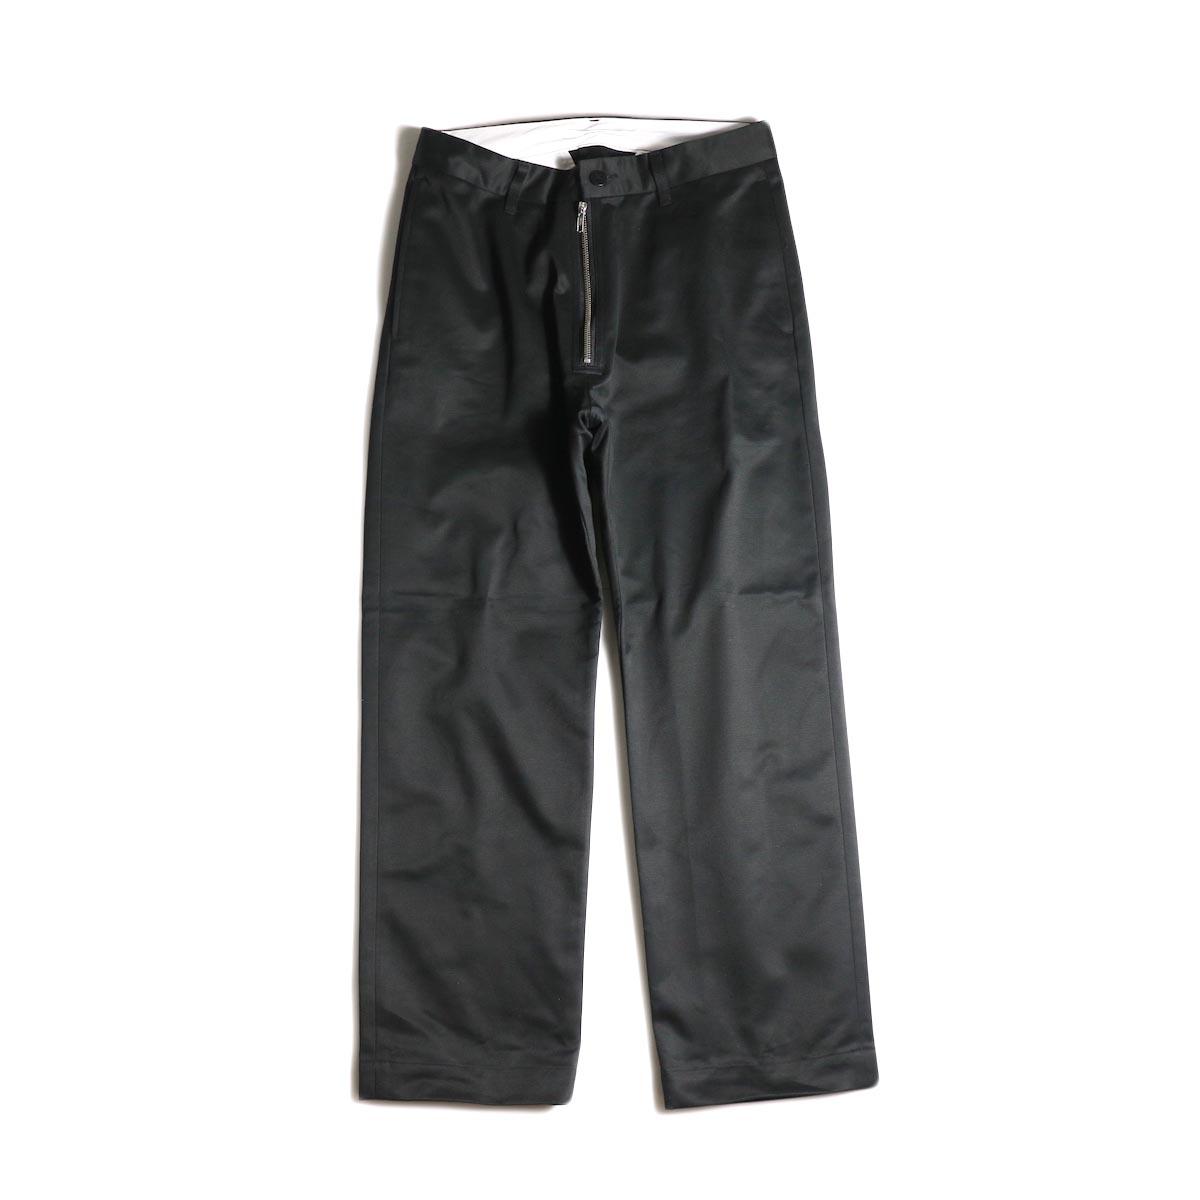 FUTURE PRIMITIVE / FP FZ CHINO PANTS (Black)正面